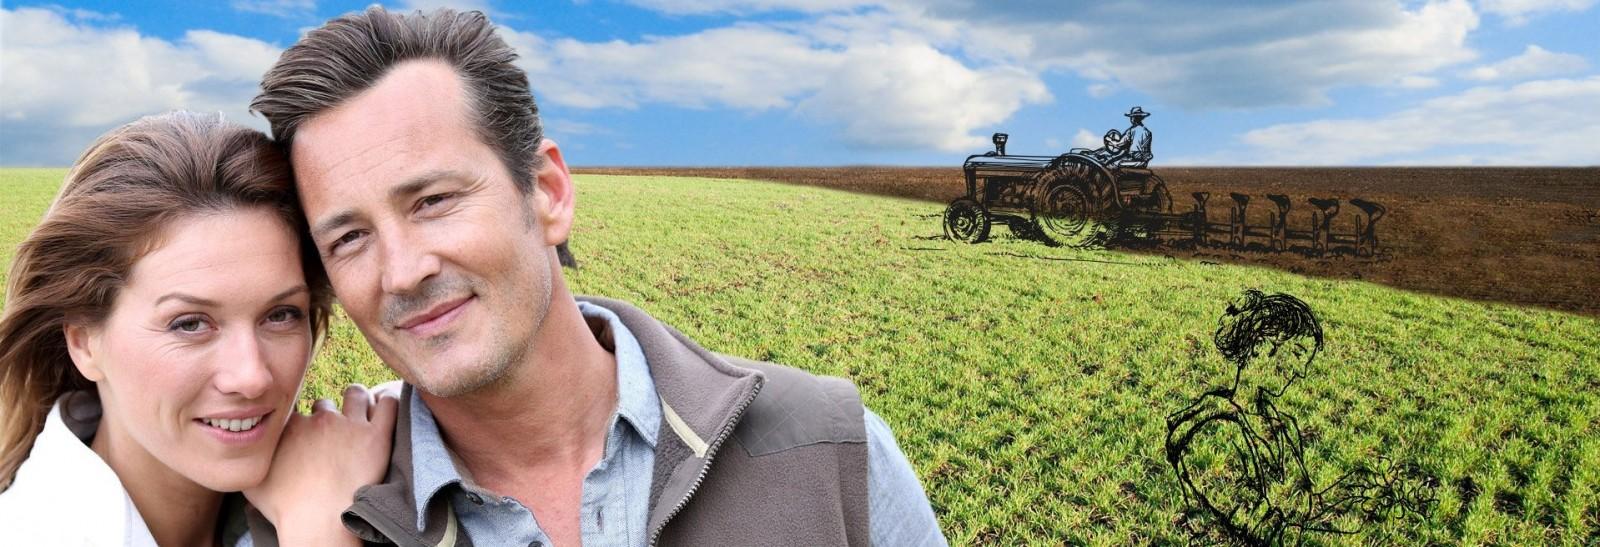 agriculteurs qui veulent s'installer